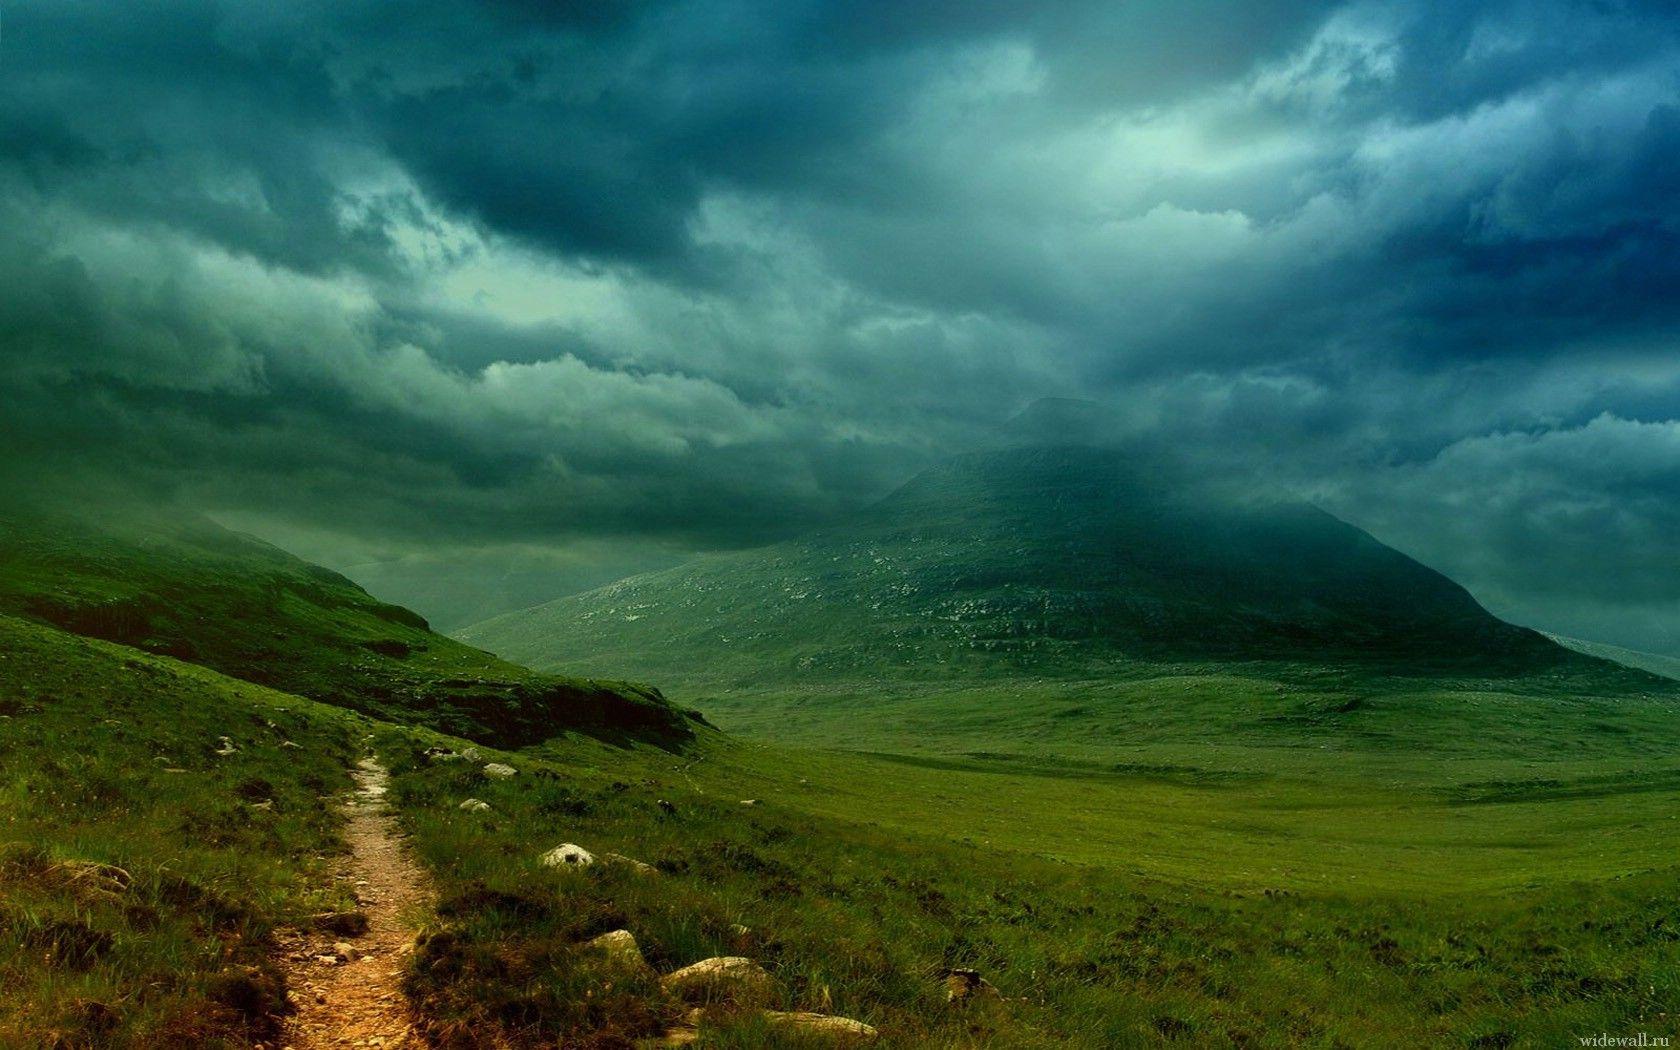 Most Inspiring Wallpaper Mountain Rain - 03dfe0fdcf409c625fc13538ef7da38f  Graphic_829013.jpg